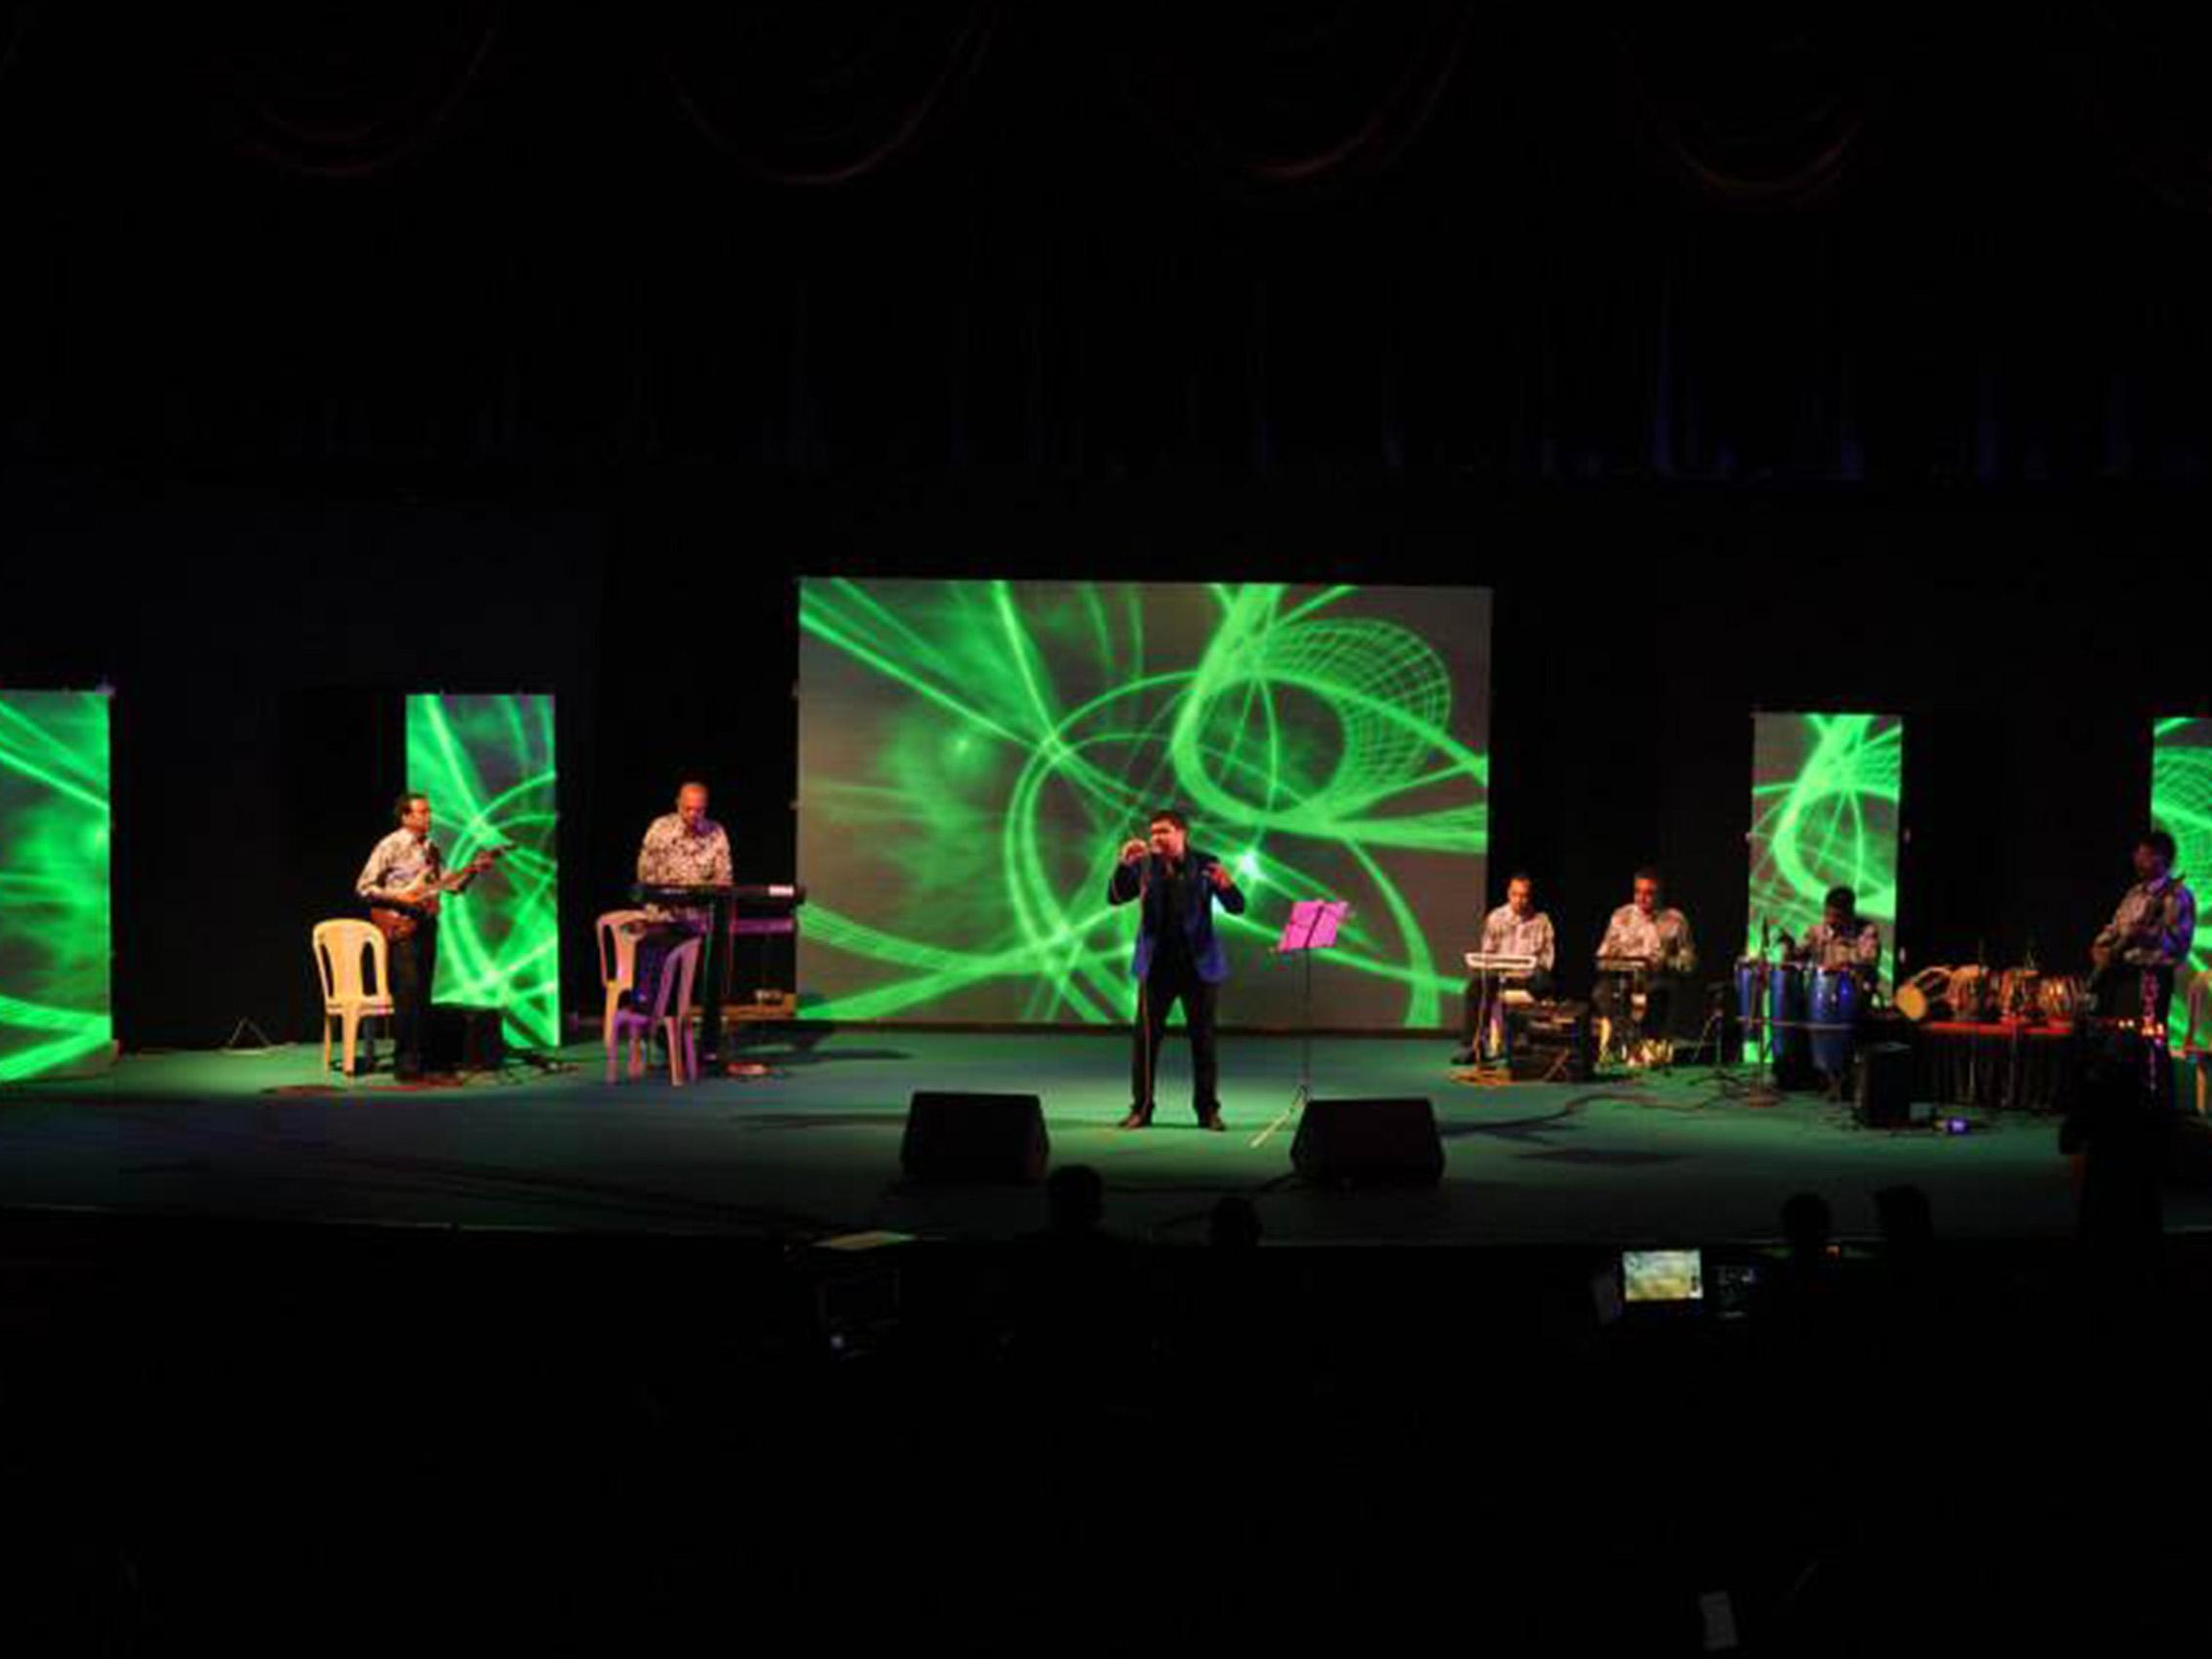 3ebd2 0084 - Tuhi Meri Zindagi- Musical night by Pritesh Shah